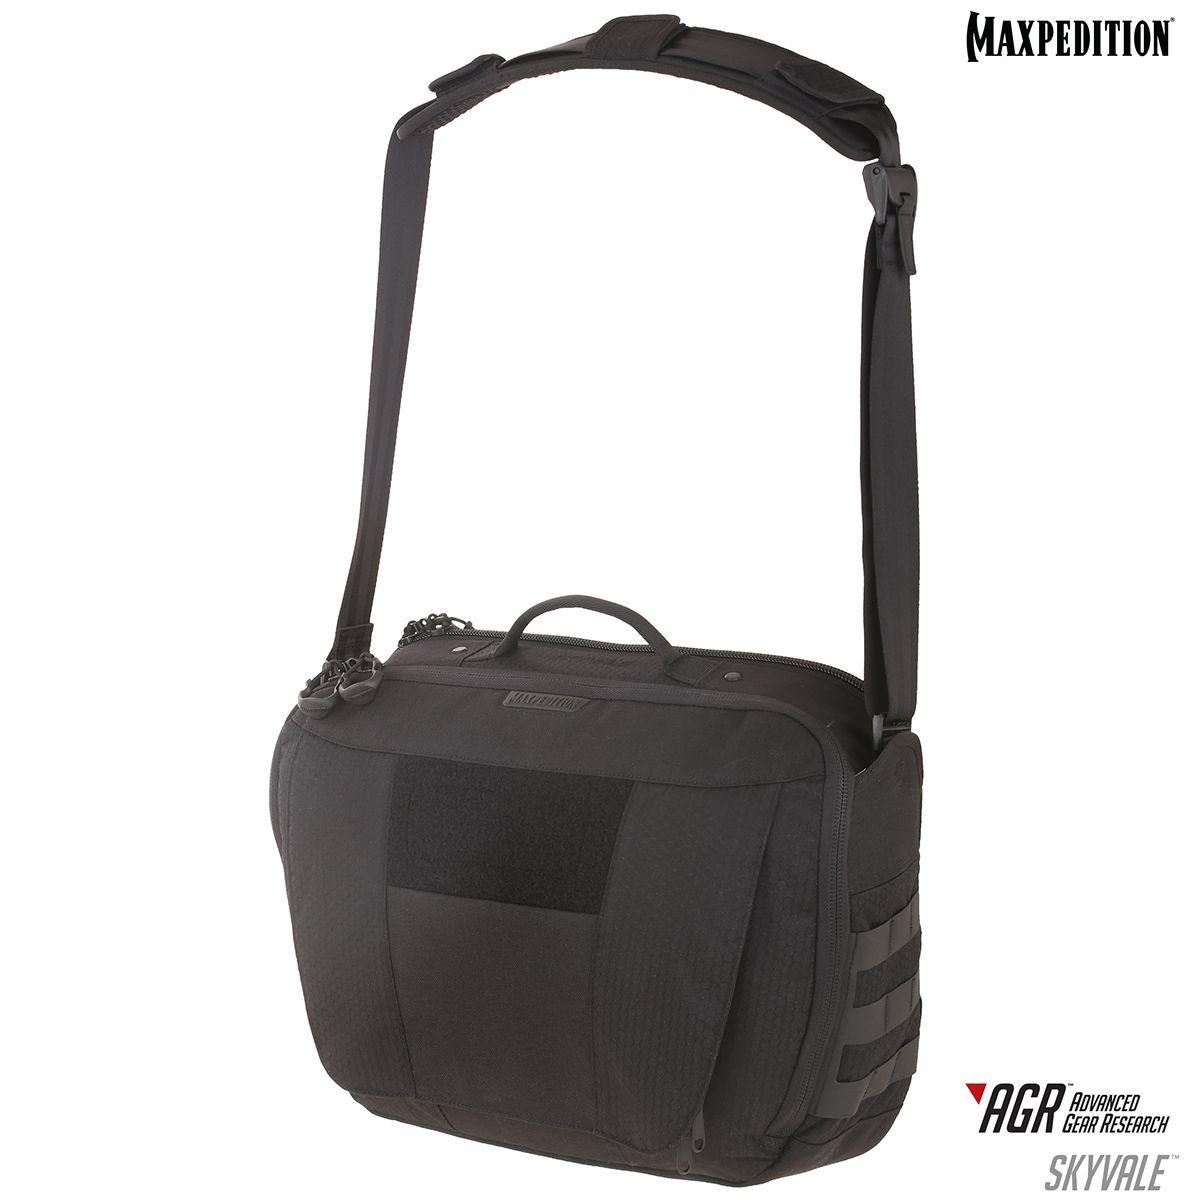 Maxpedition SKYBLK AGR Advanced Gear Research Skyvale 16L Tech Messenger Bag, Black